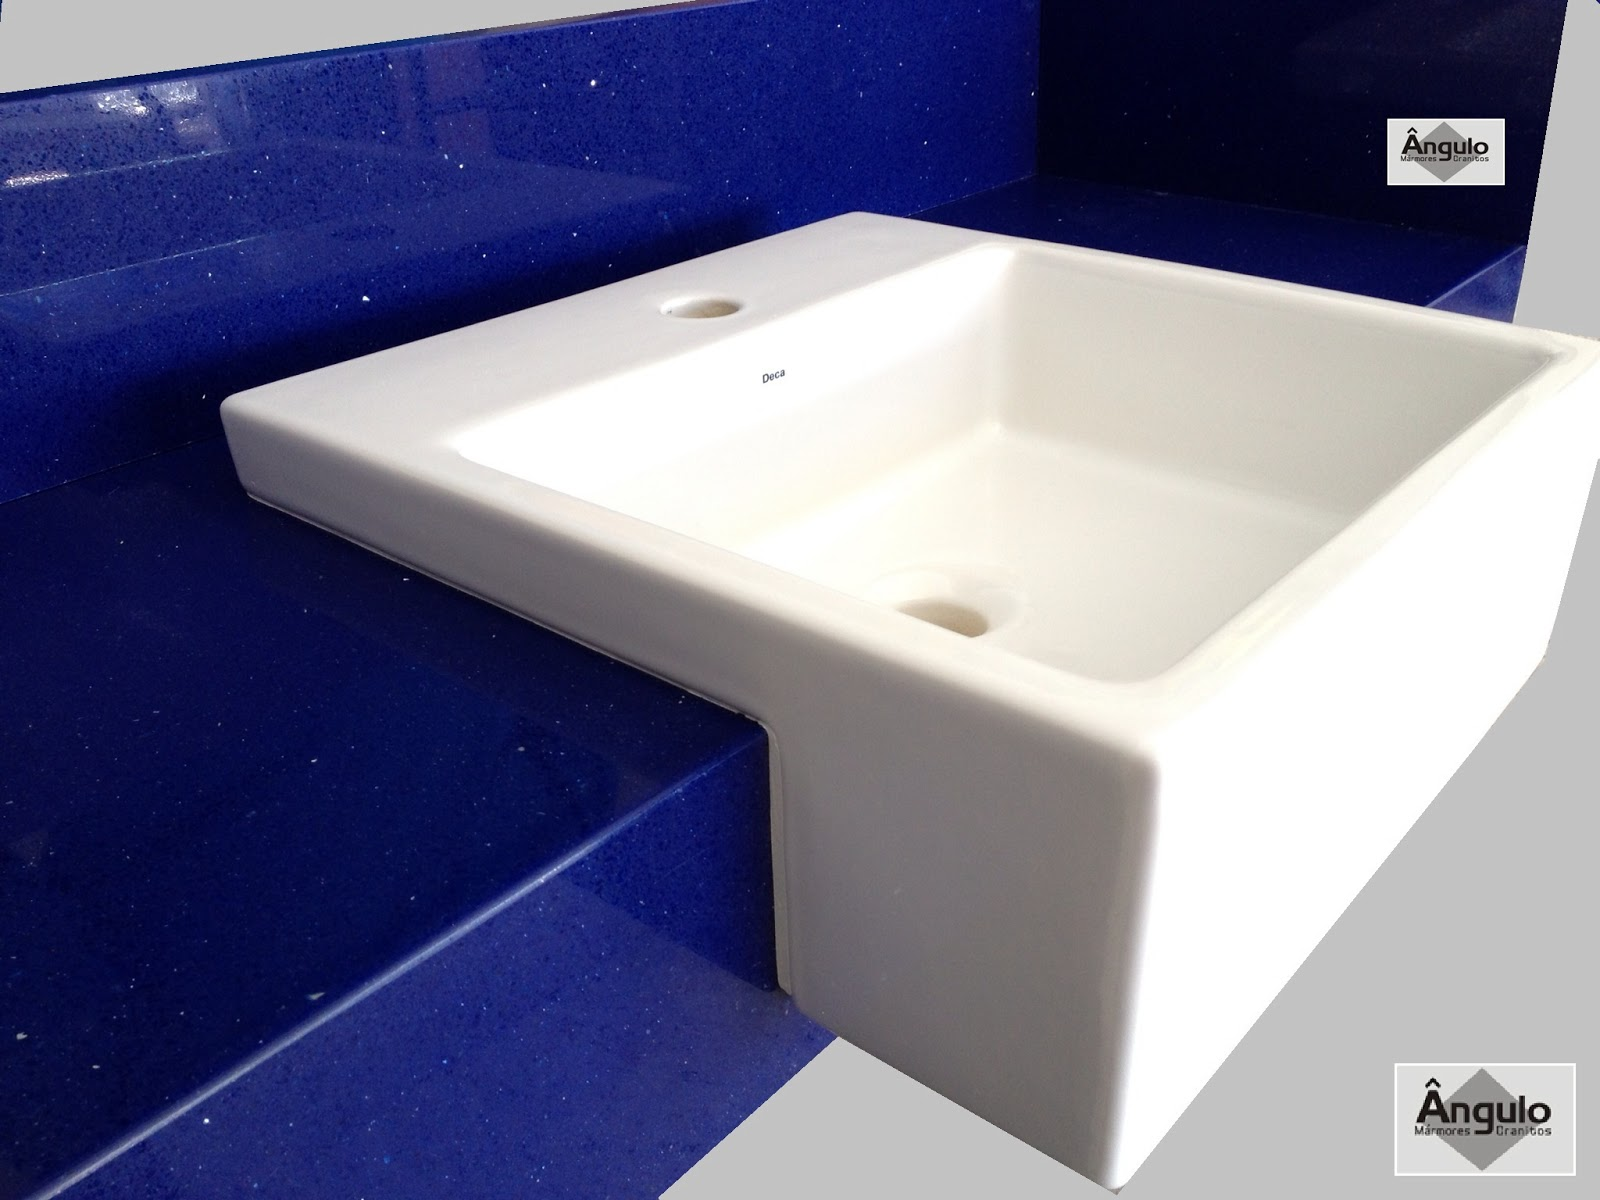 Ângulo Mármores e Granitos: Silestone Azul Stellar #070938 1600x1200 Bancada Banheiro Silestone Vermelho